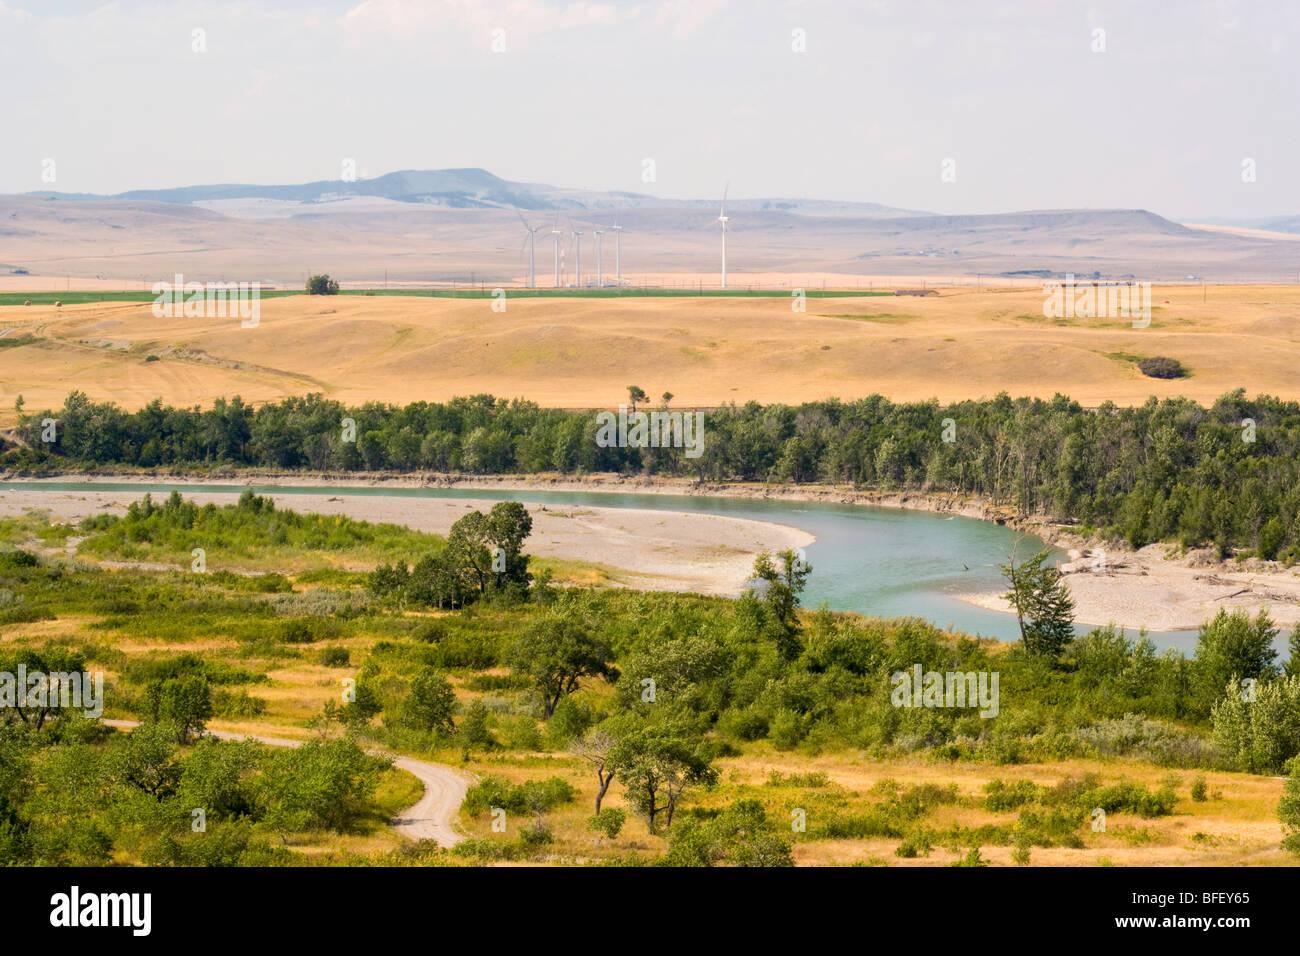 Windkraftanlagen, Pincher Creek, Alberta, Kanada, Fluss, Energie, Alternative Energie Stockbild